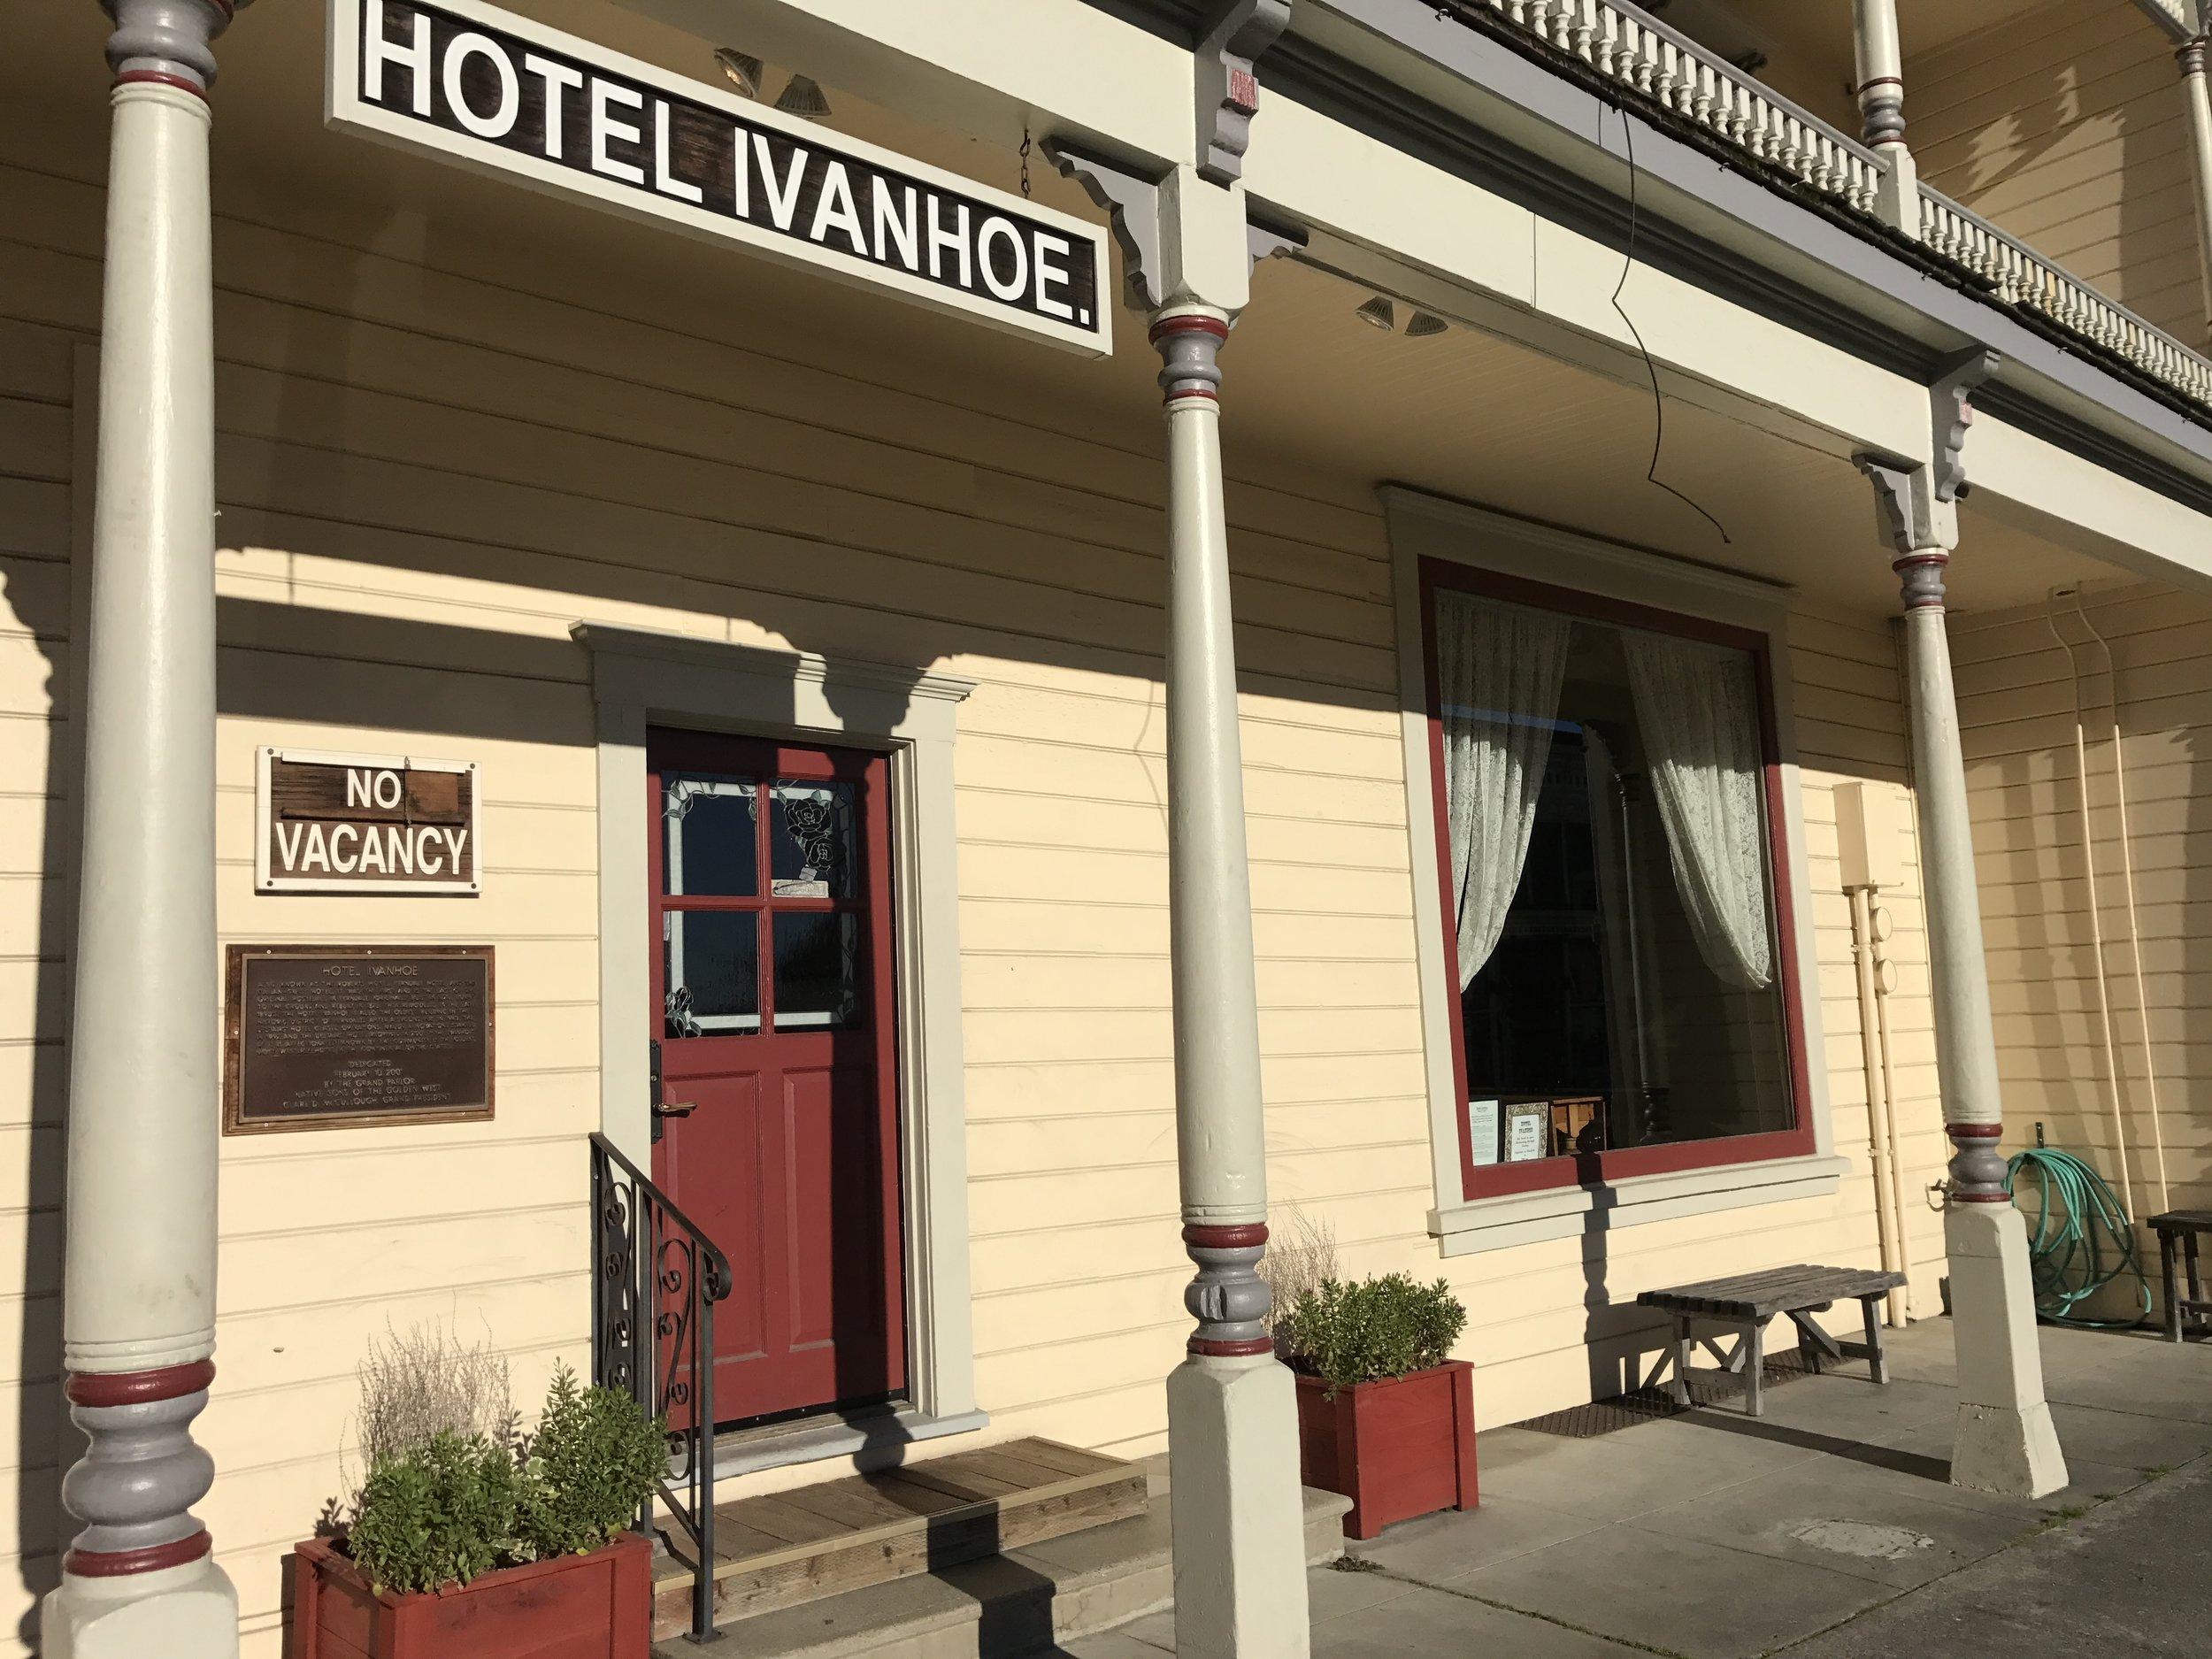 Hotel Ivanhoe in Ferndale, California